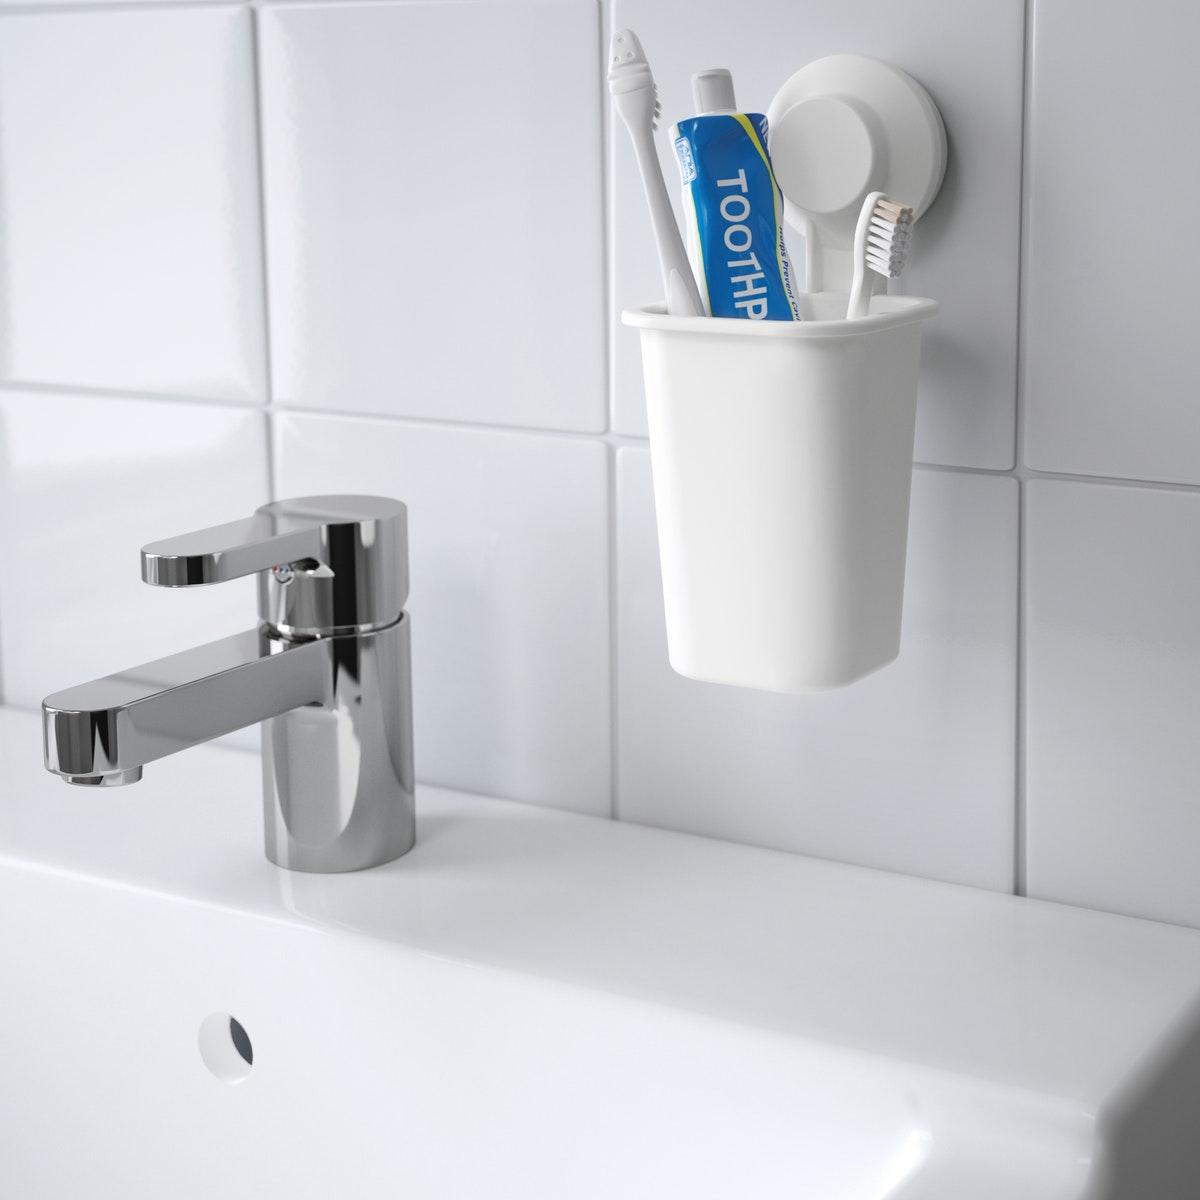 Ciptakan kamar mandi tanpa harus melubangi dinding